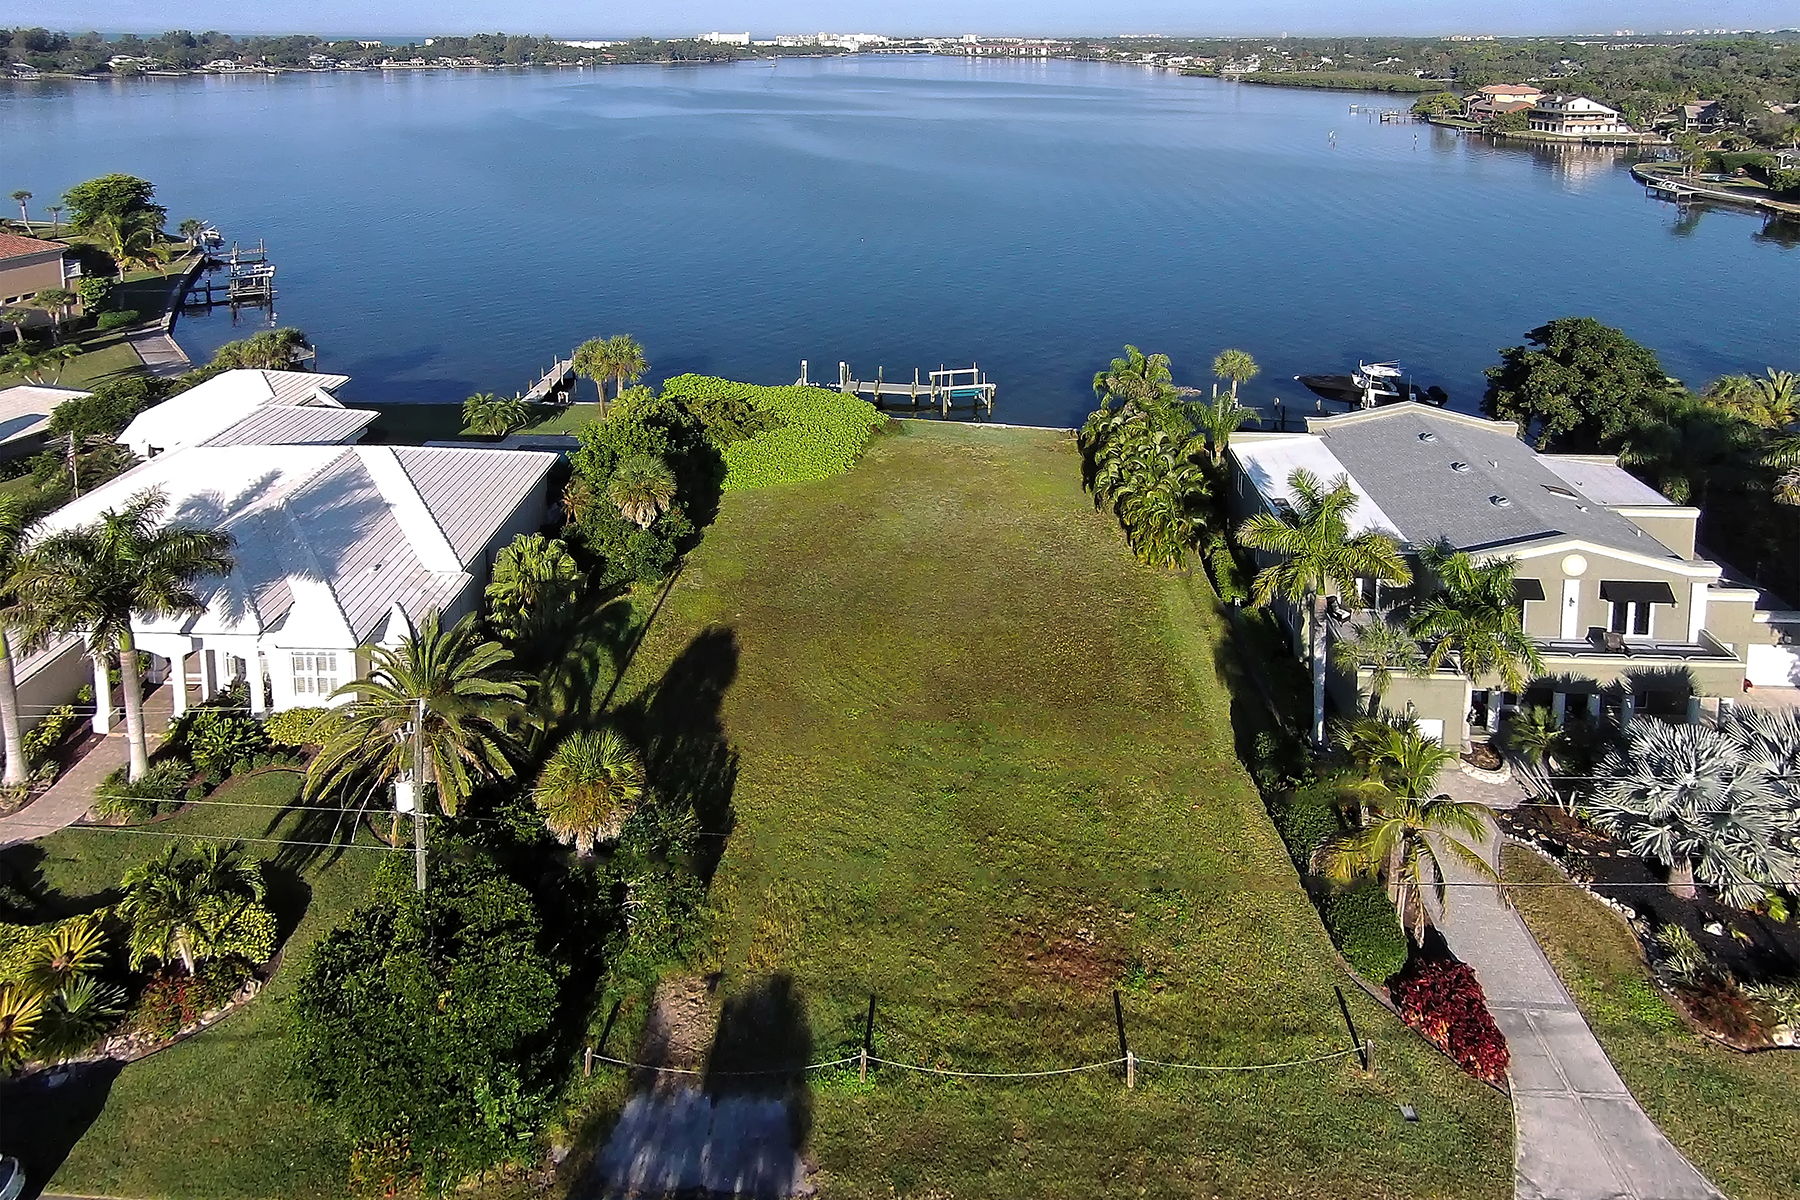 Land for Sale at SARASOTA 1613 Caribbean Dr 4 Sarasota, Florida 34231 United States